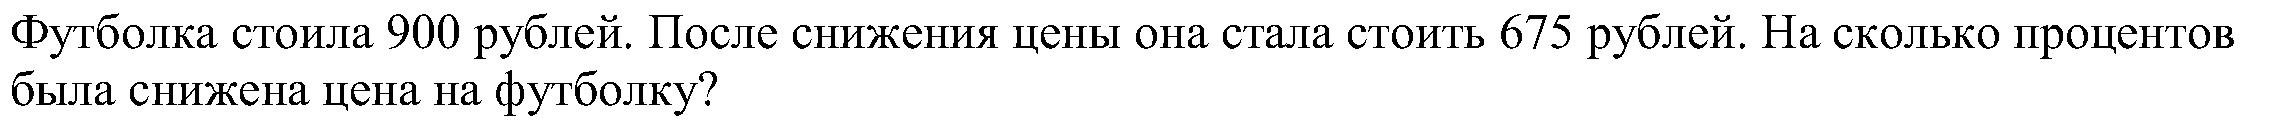 hello_html_m385f87f8.png